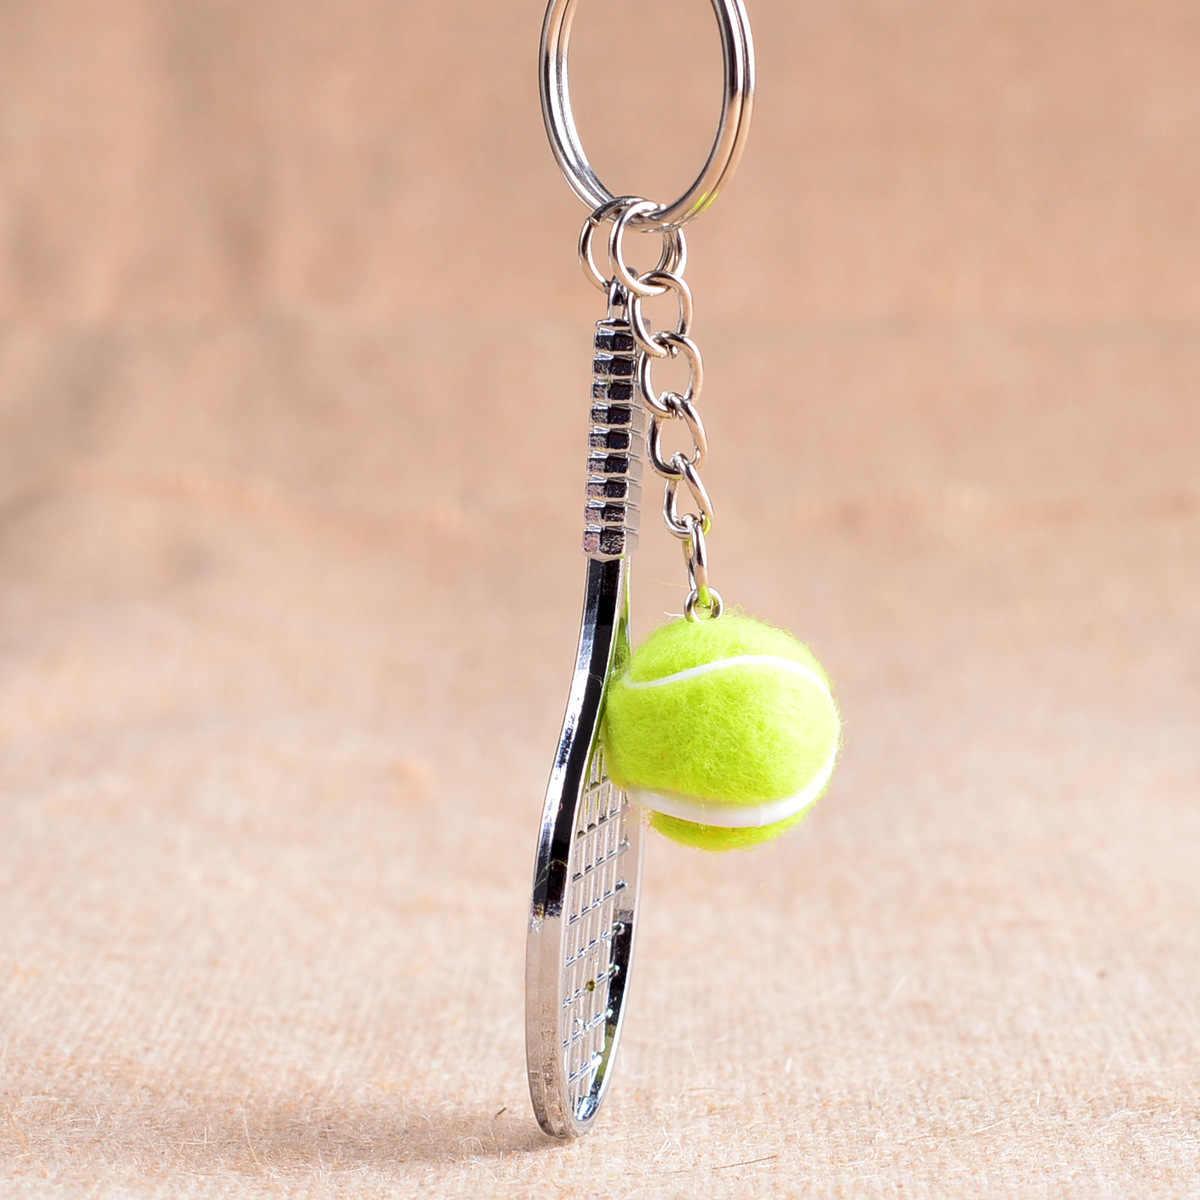 Mini Metal Tennis Racket Souvenir Cute Tenis Racquet Ball Key-chain Sports Key Chain Car Bike Keyring Simulation Gift L770